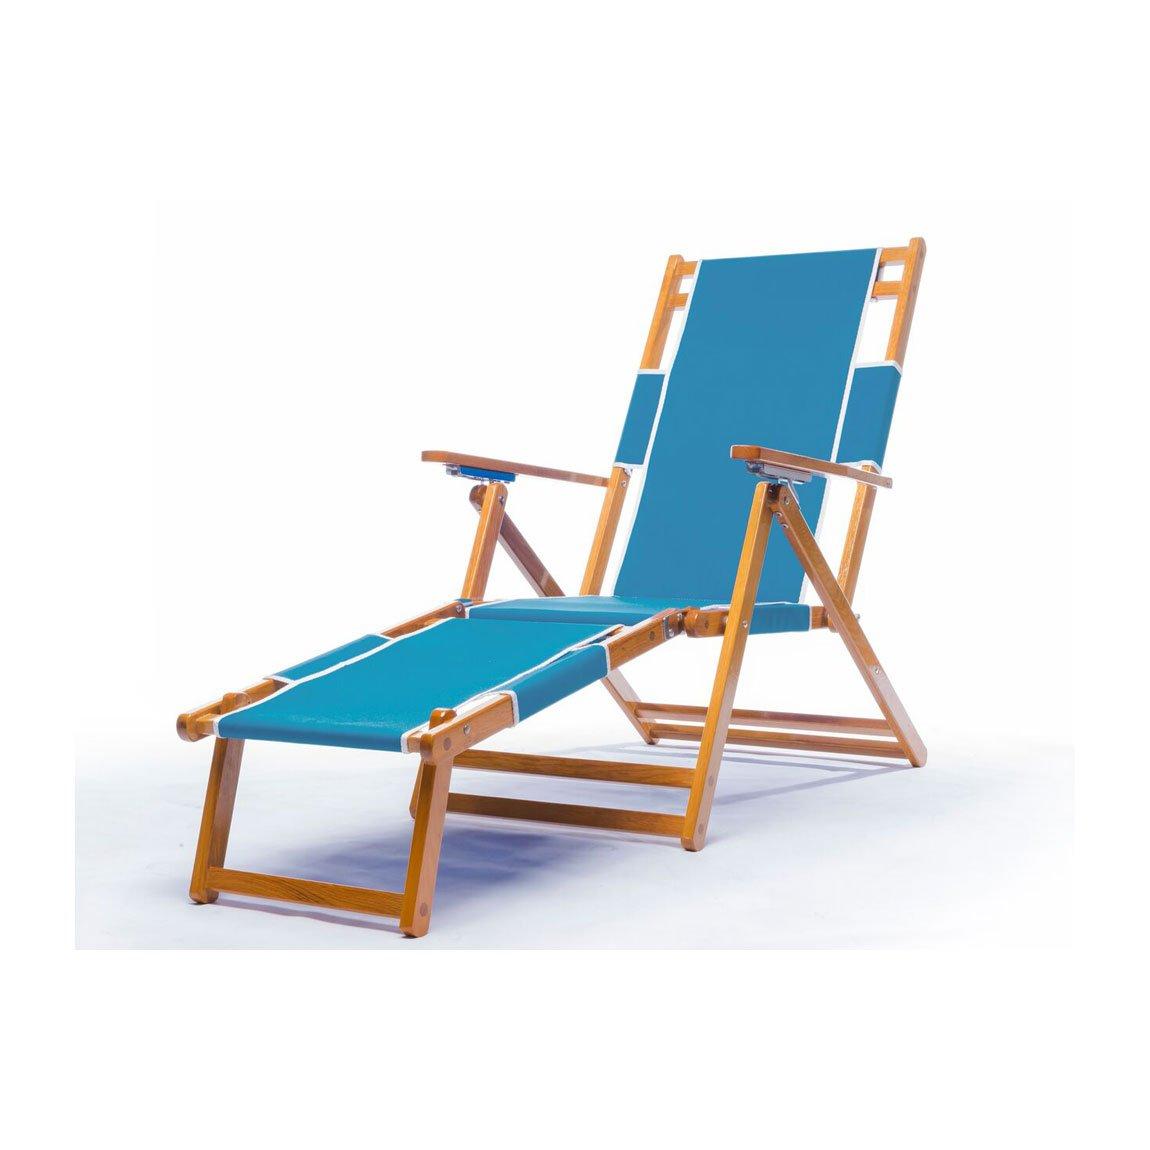 Heavy Duty商用グレードオークウッドビーチ椅子/ Chaise Lounger B00WC91YFW No Drink Holder / Add Foot Rest|カプリ カプリ No Drink Holder / Add Foot Rest